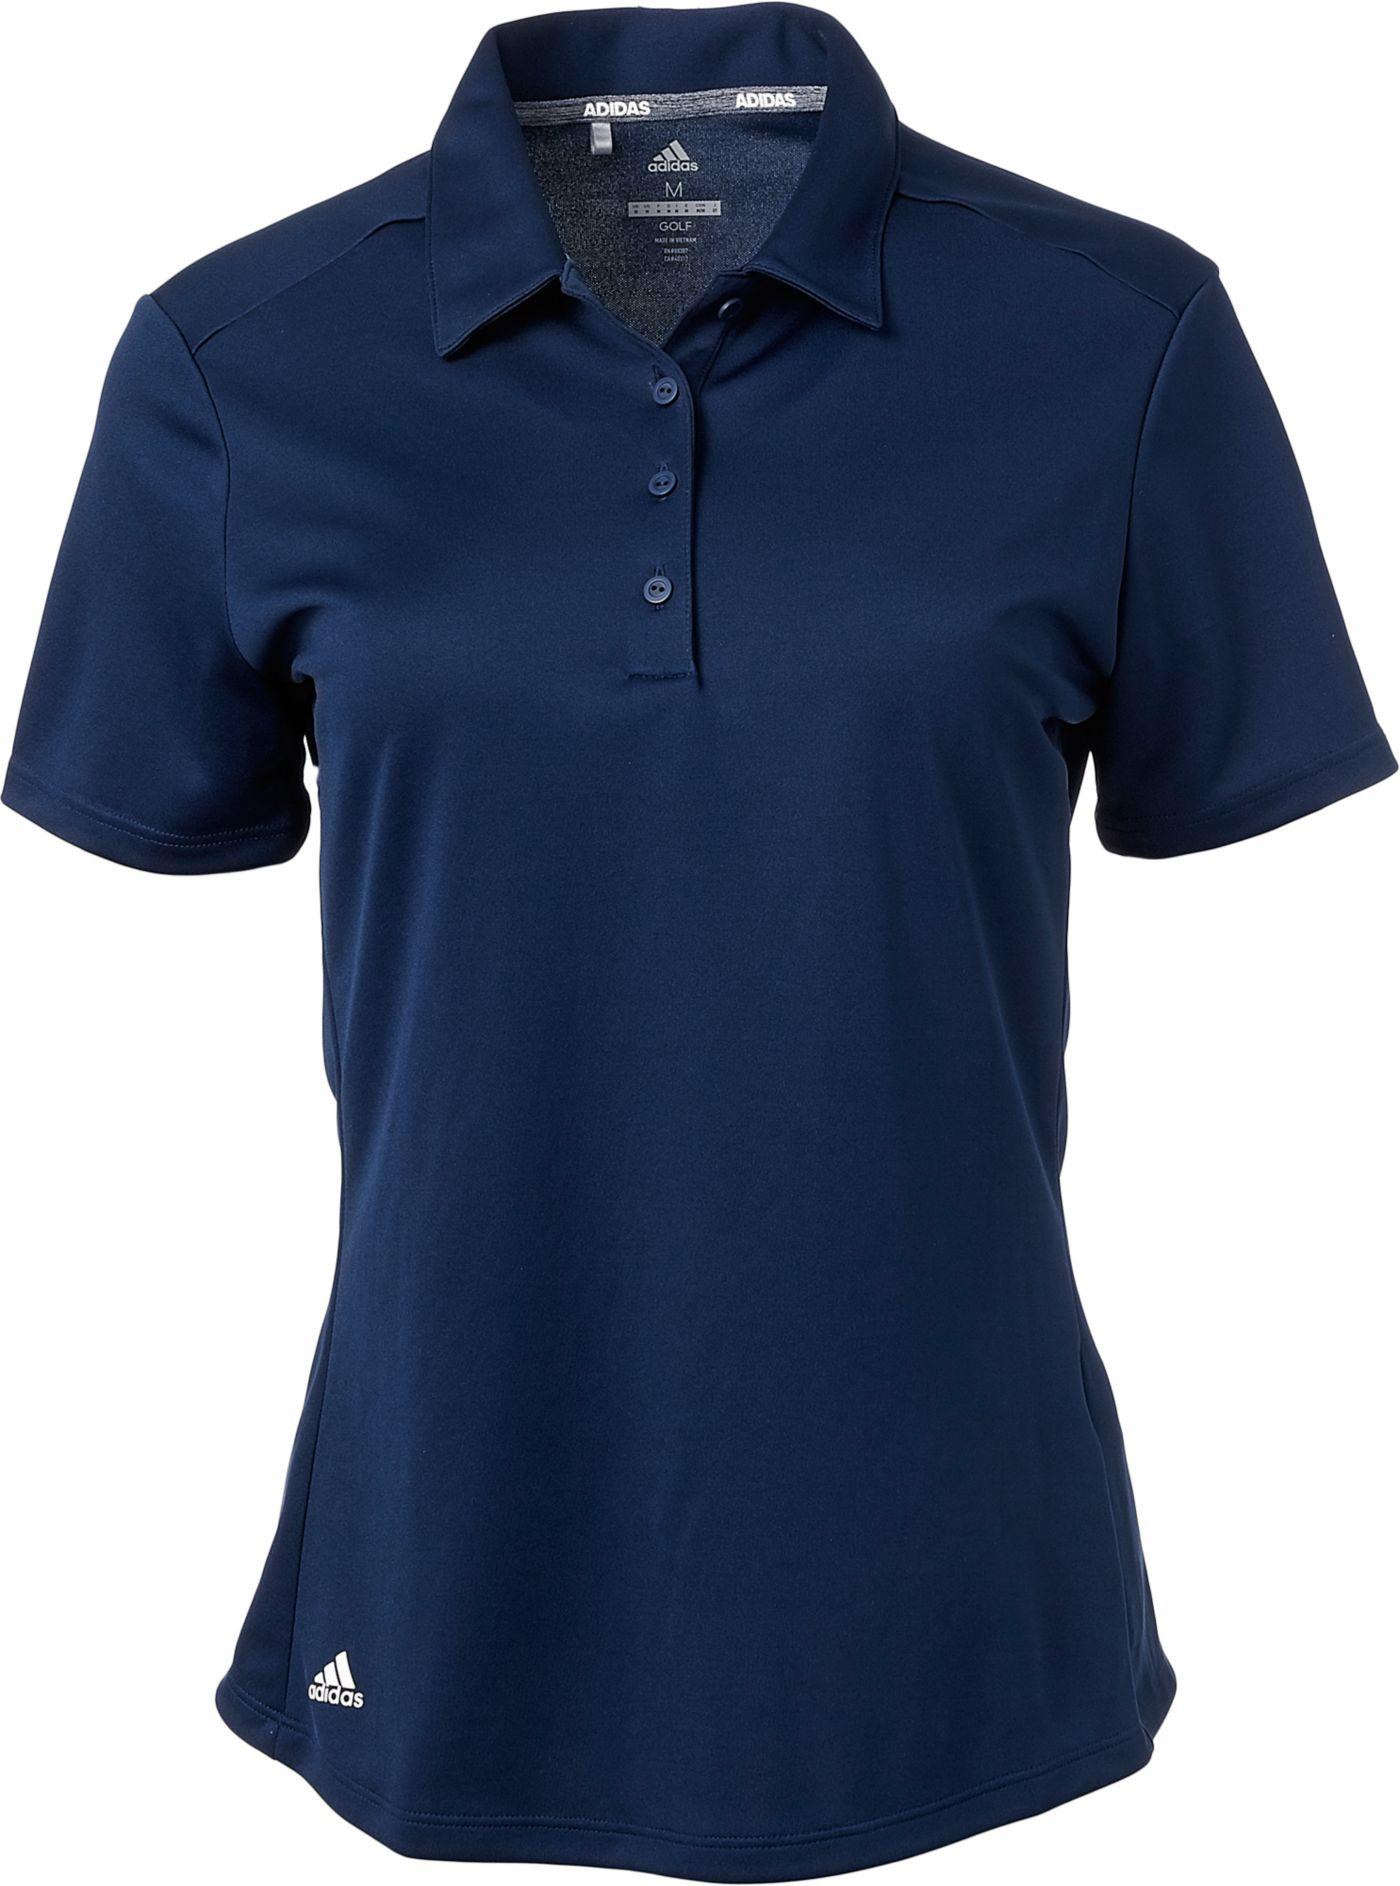 adidas Women's Drive Golf Polo